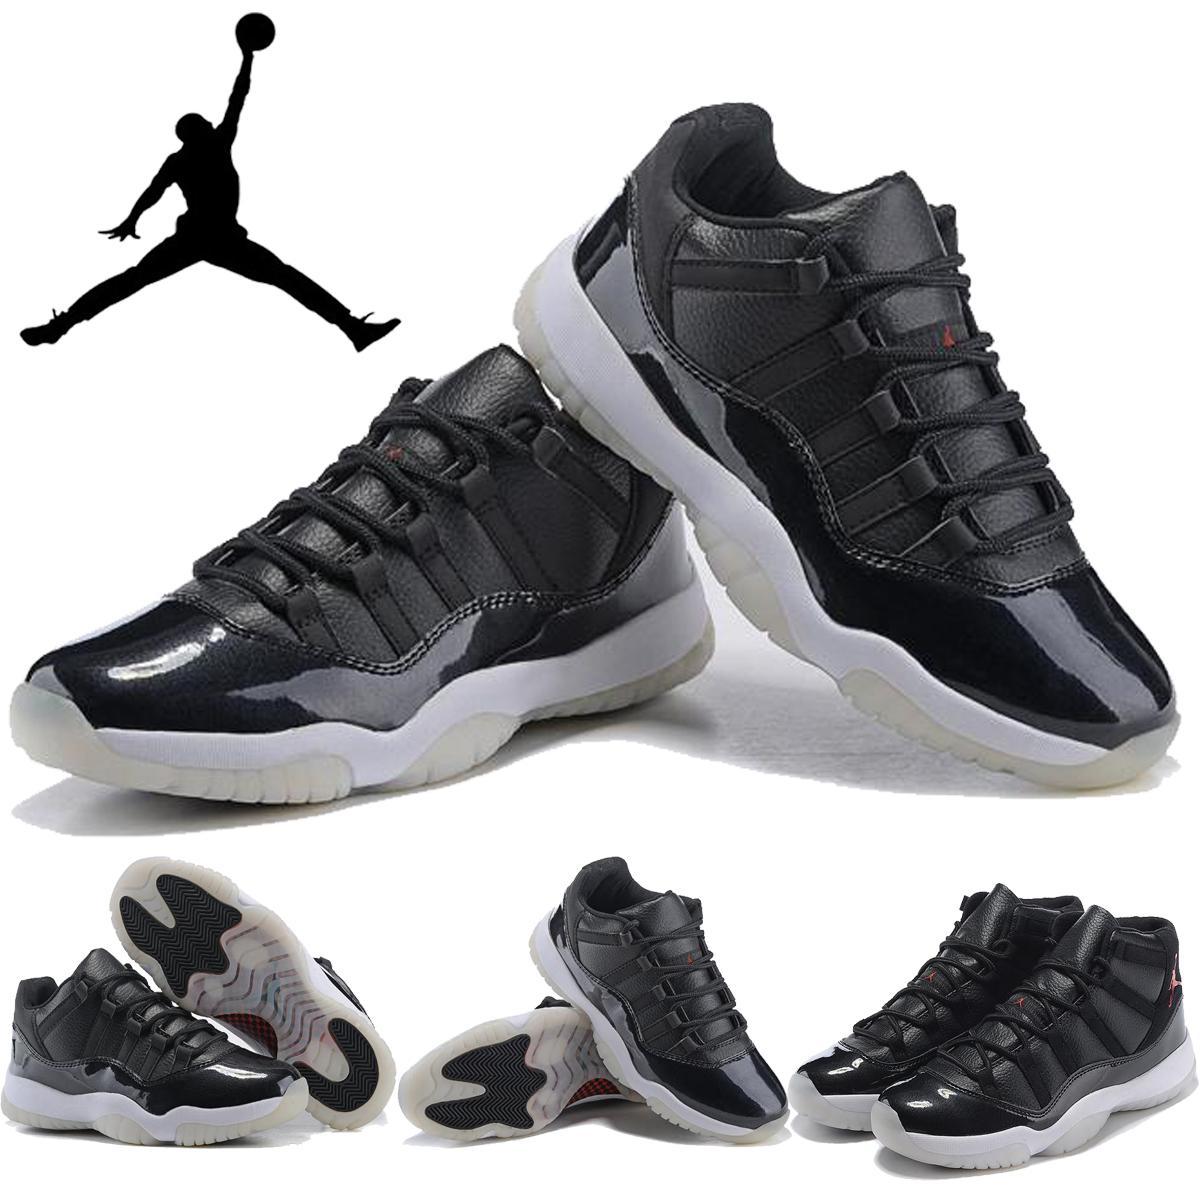 on sale 18b02 f6515 Nike Air Jordan 11 72 10 High And Low Black White Red Mens Basketball Shoes,Jordan  Retro XI AJ11 Men Shoe Sneakers Size 8 13 Shoes Online Walking Shoes From  ...